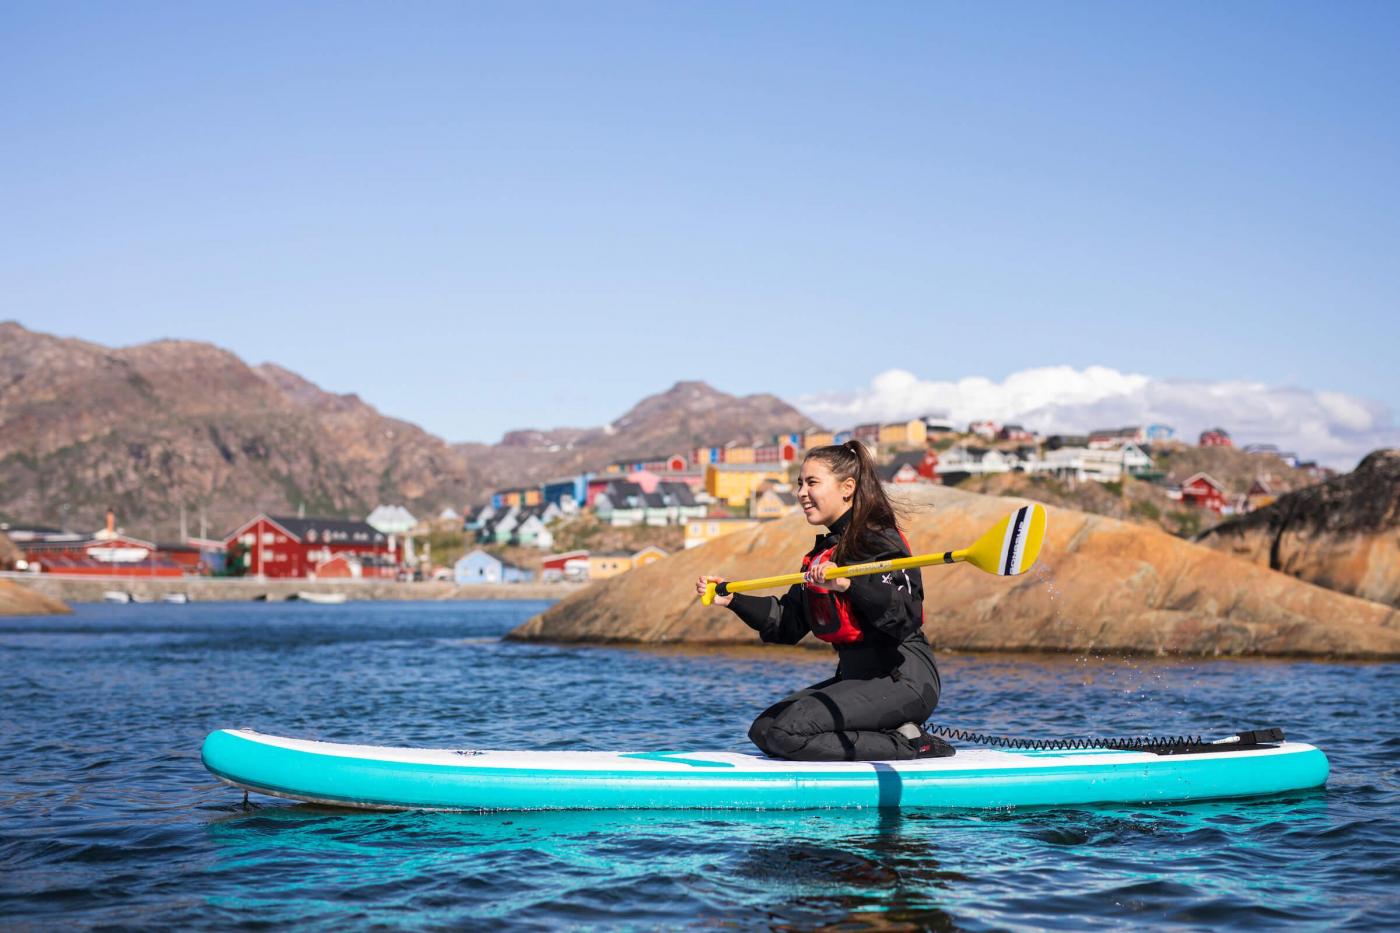 SUP near Sisimiut kneeling on her board. Photo - Aningaaq R. Carlsen, Visit Greenland